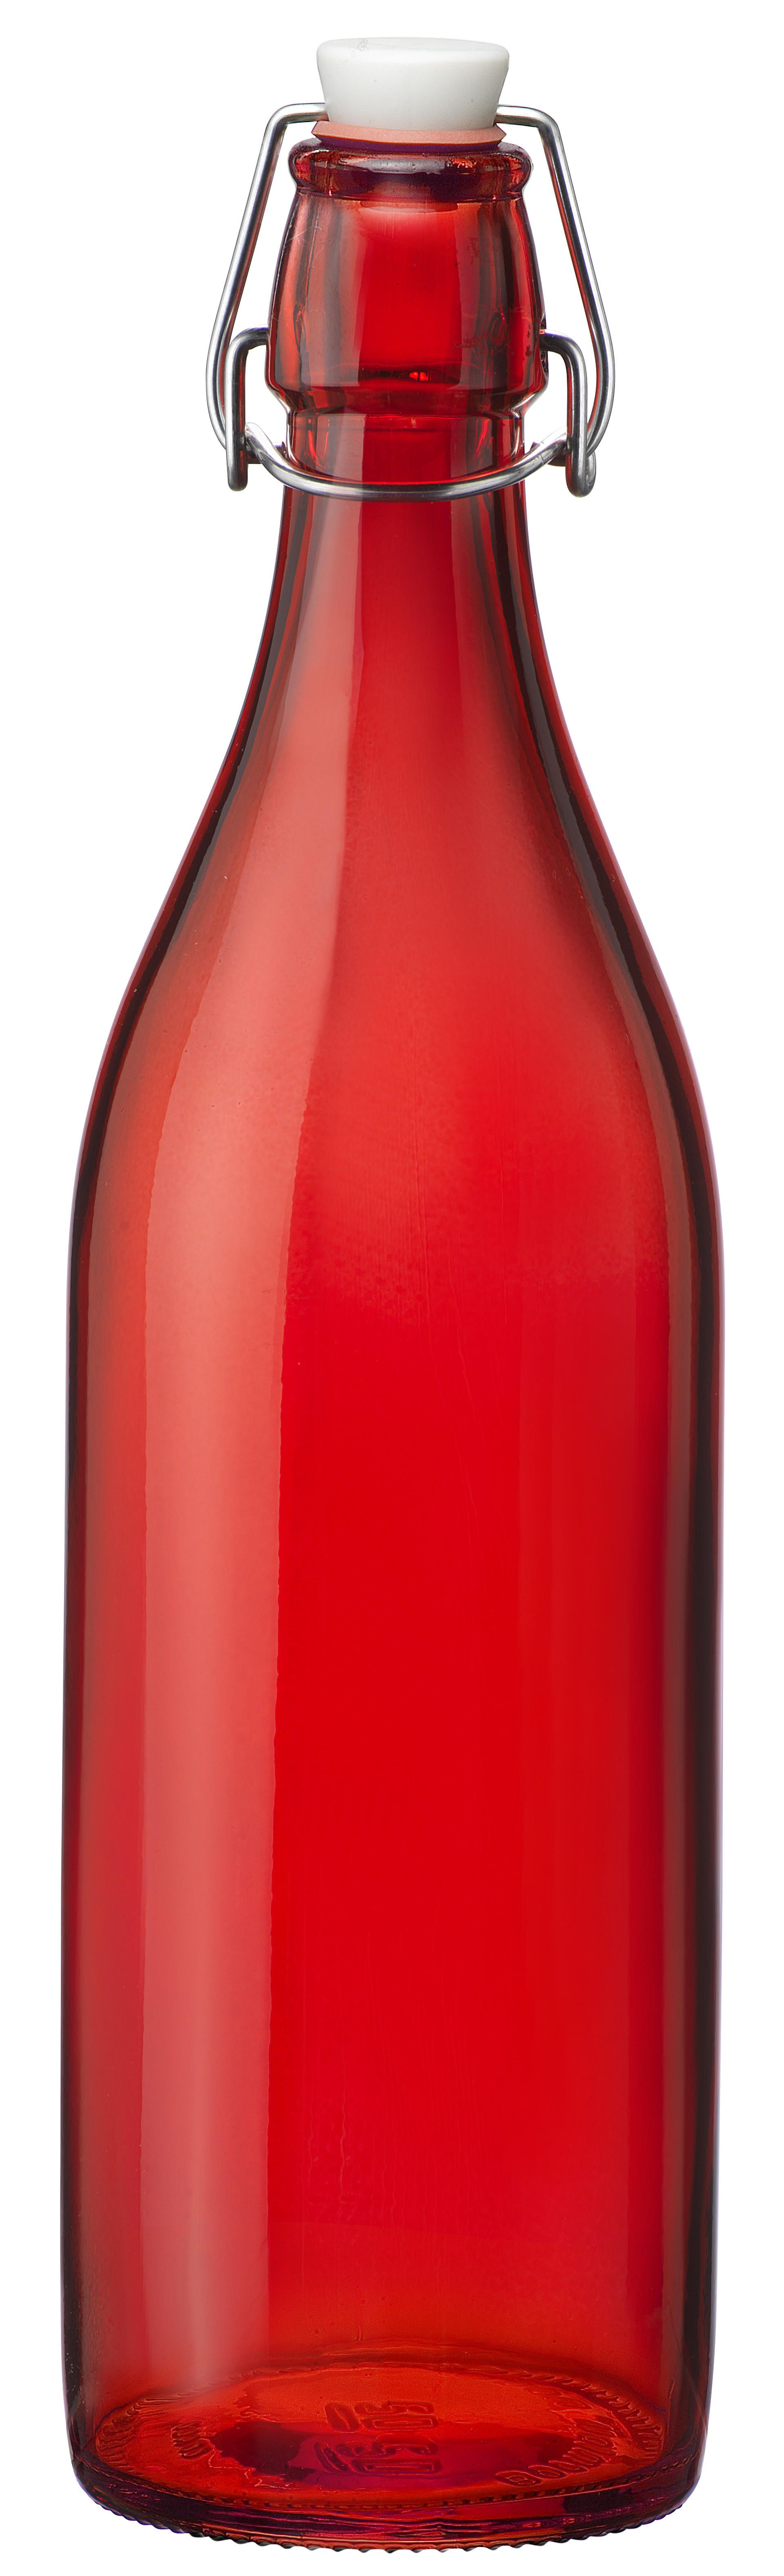 Bormioli beugelfles Giara rood